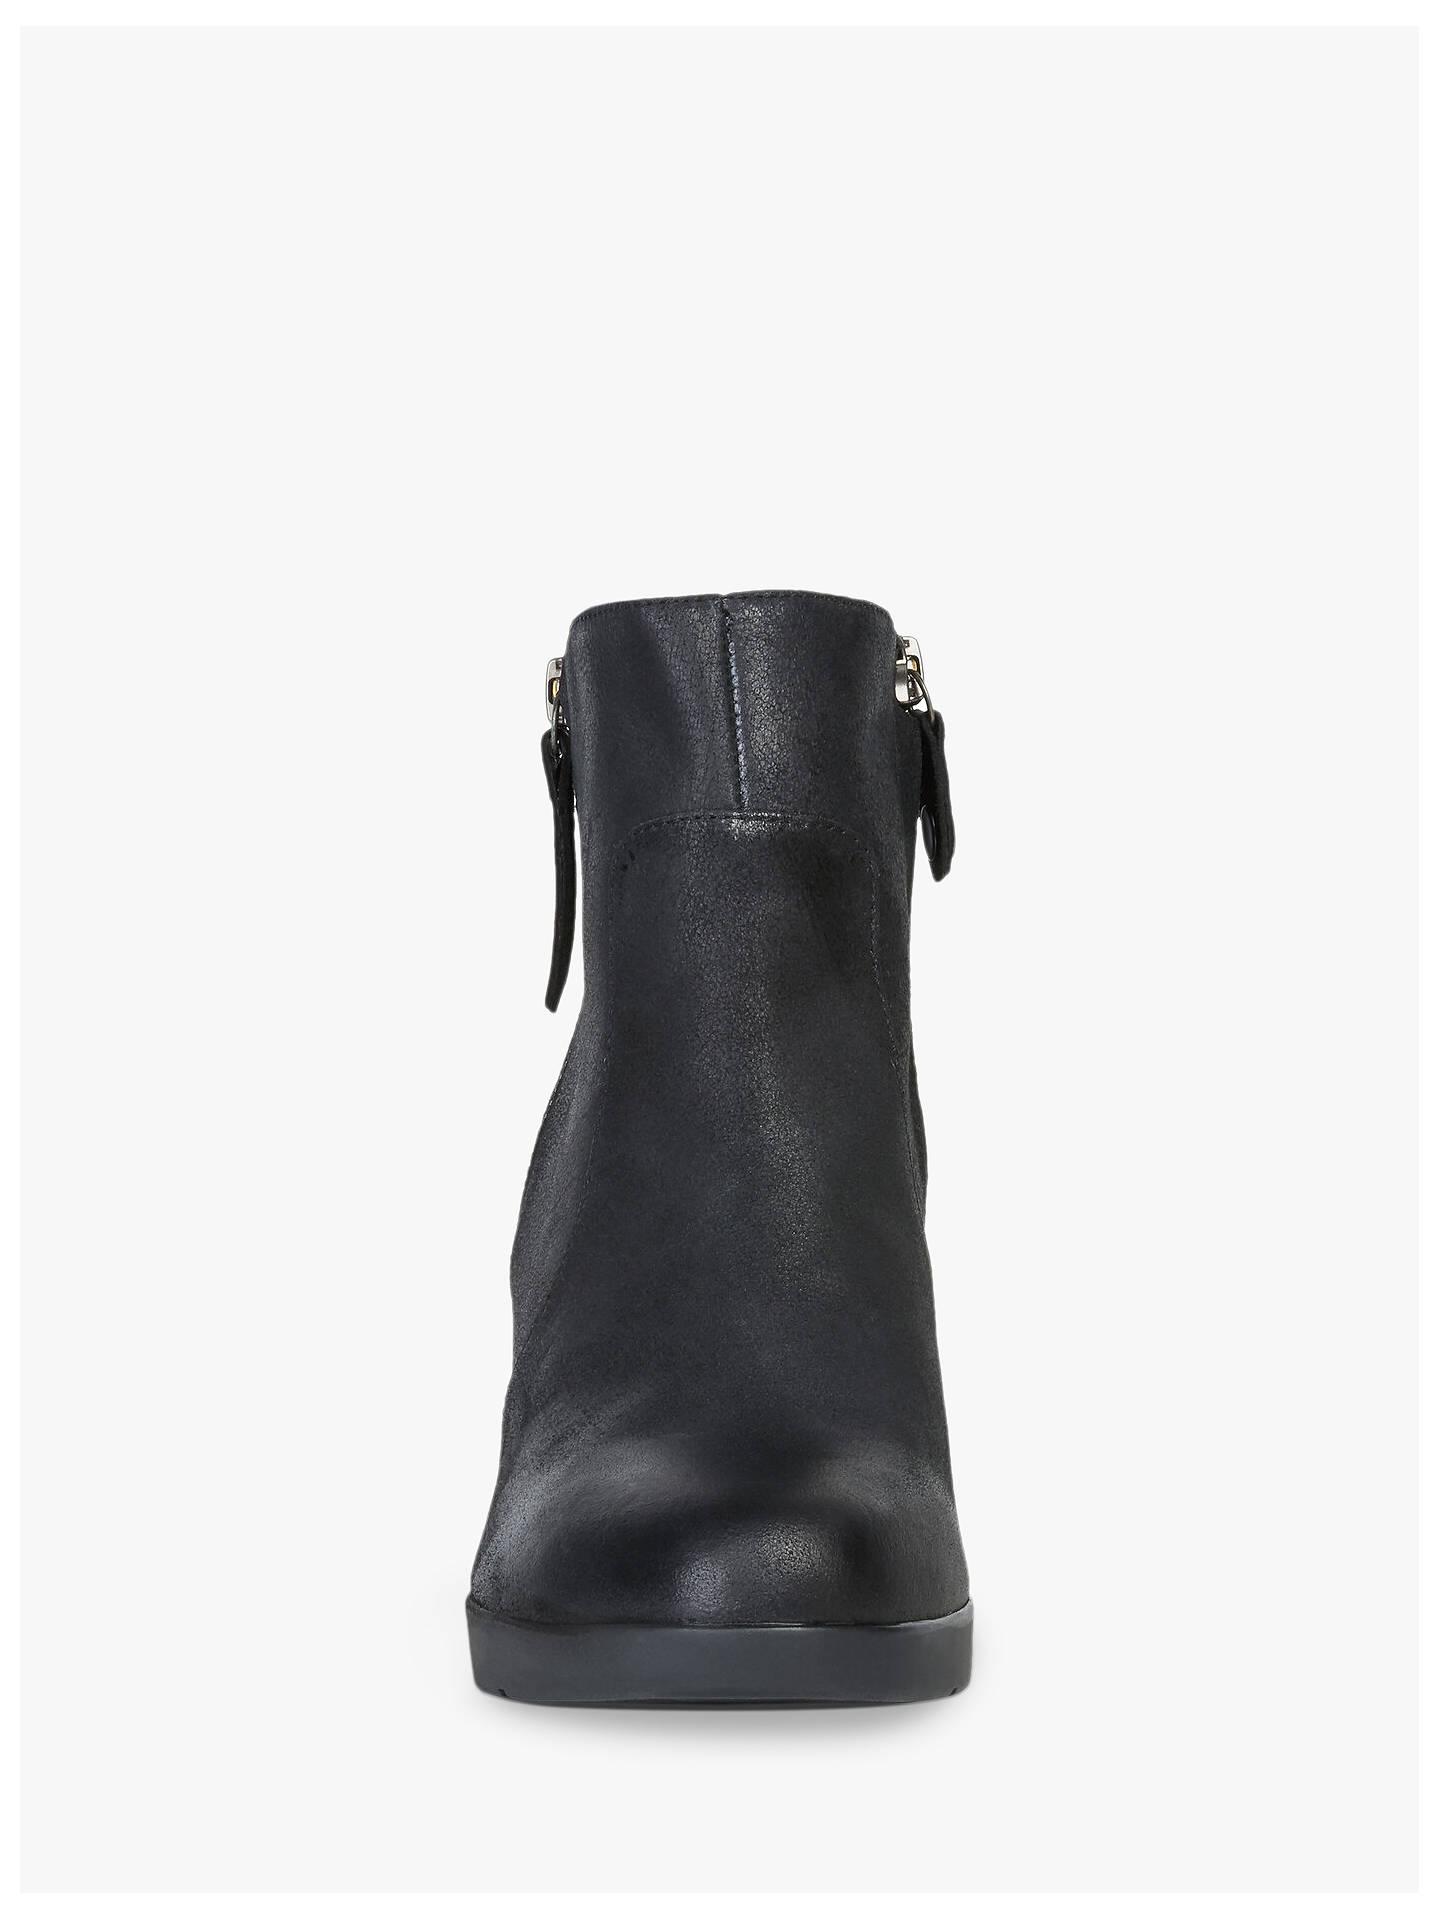 Geox Women's Aneeka Ankle Boots, Black